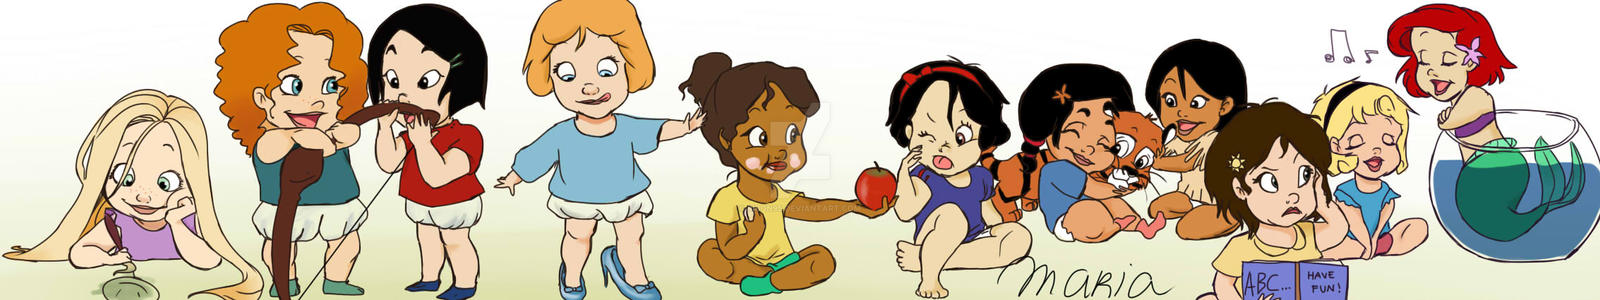 Baby Disney Princesses